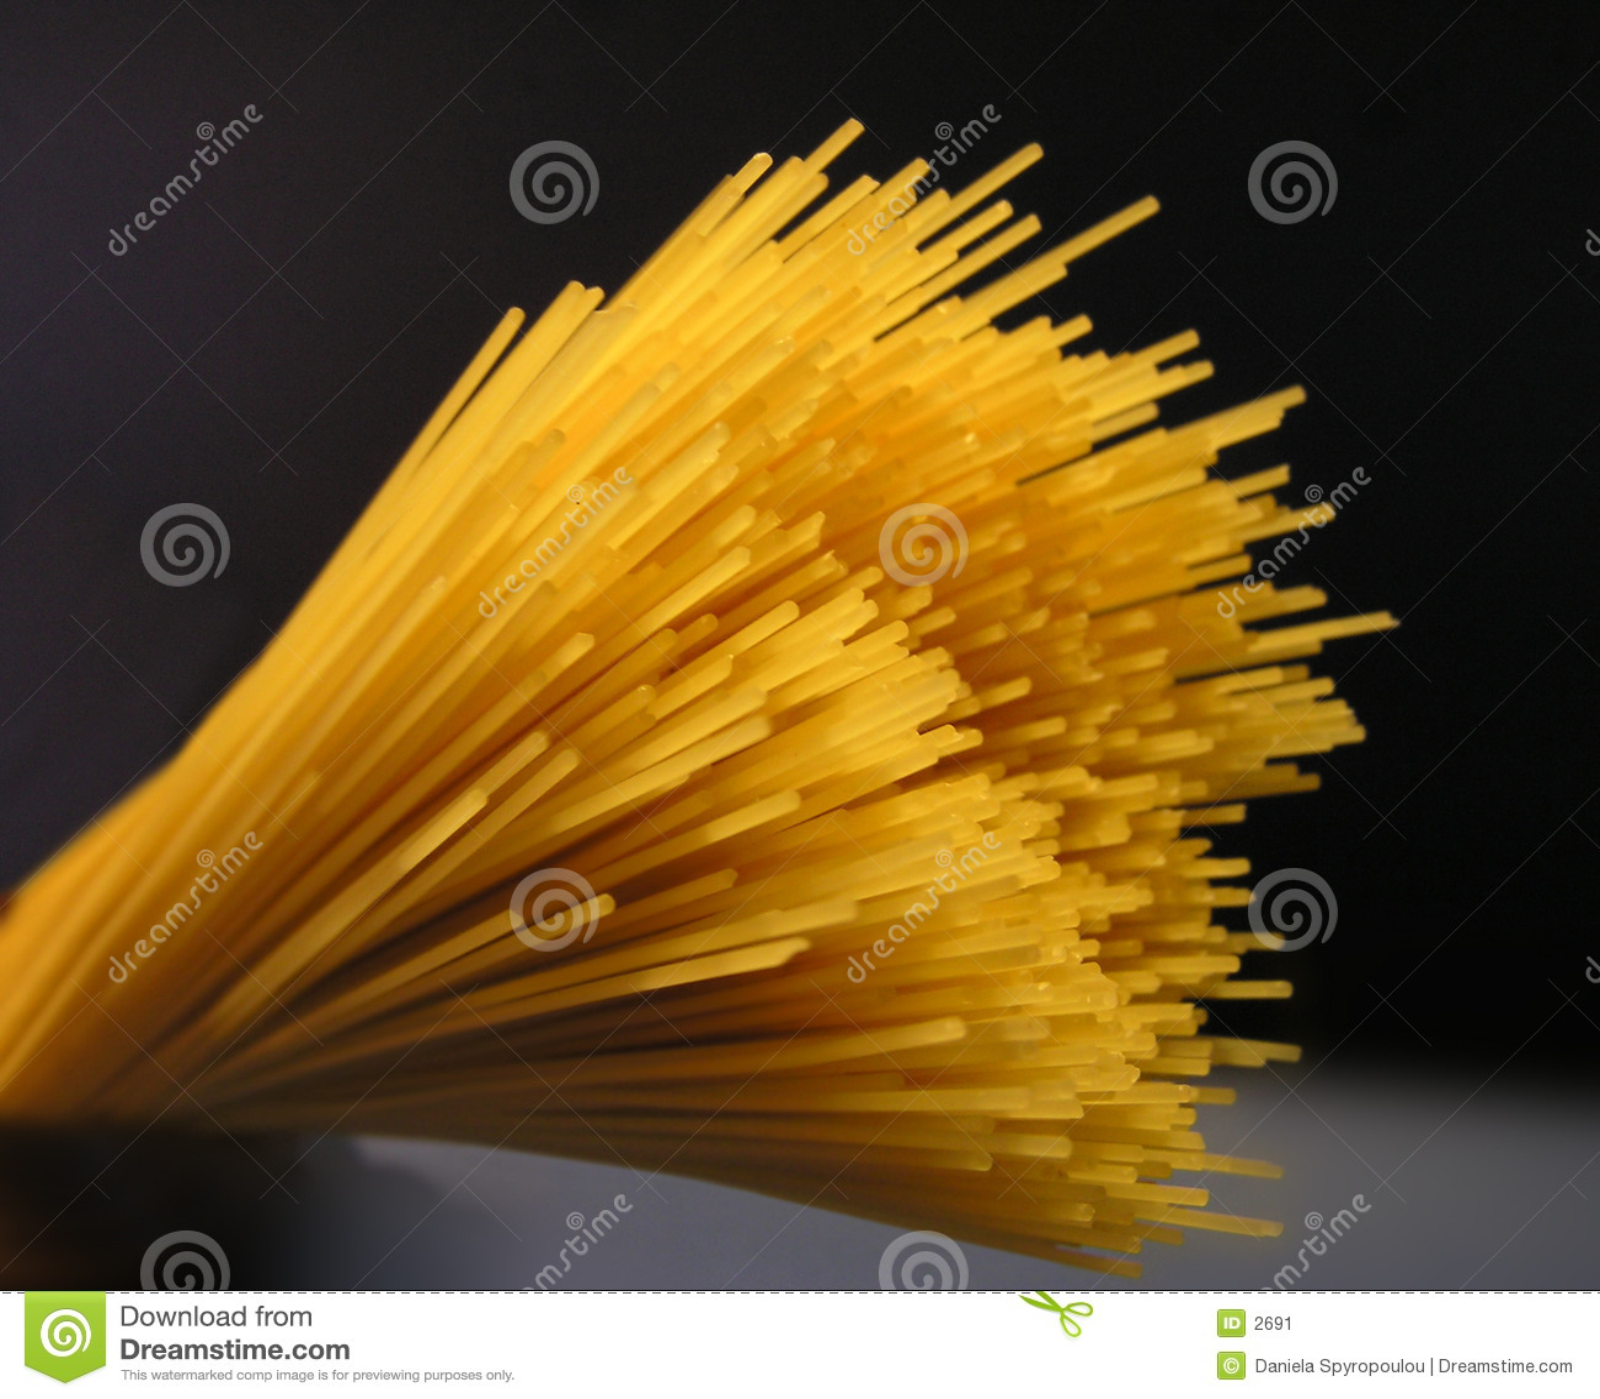 Download 意粉 库存图片. 图片 包括有 谷物, 饮食, 意大利语, 可食用, 纹理, 成份, 烹调, 营养, 原始, 意大利 - 2691